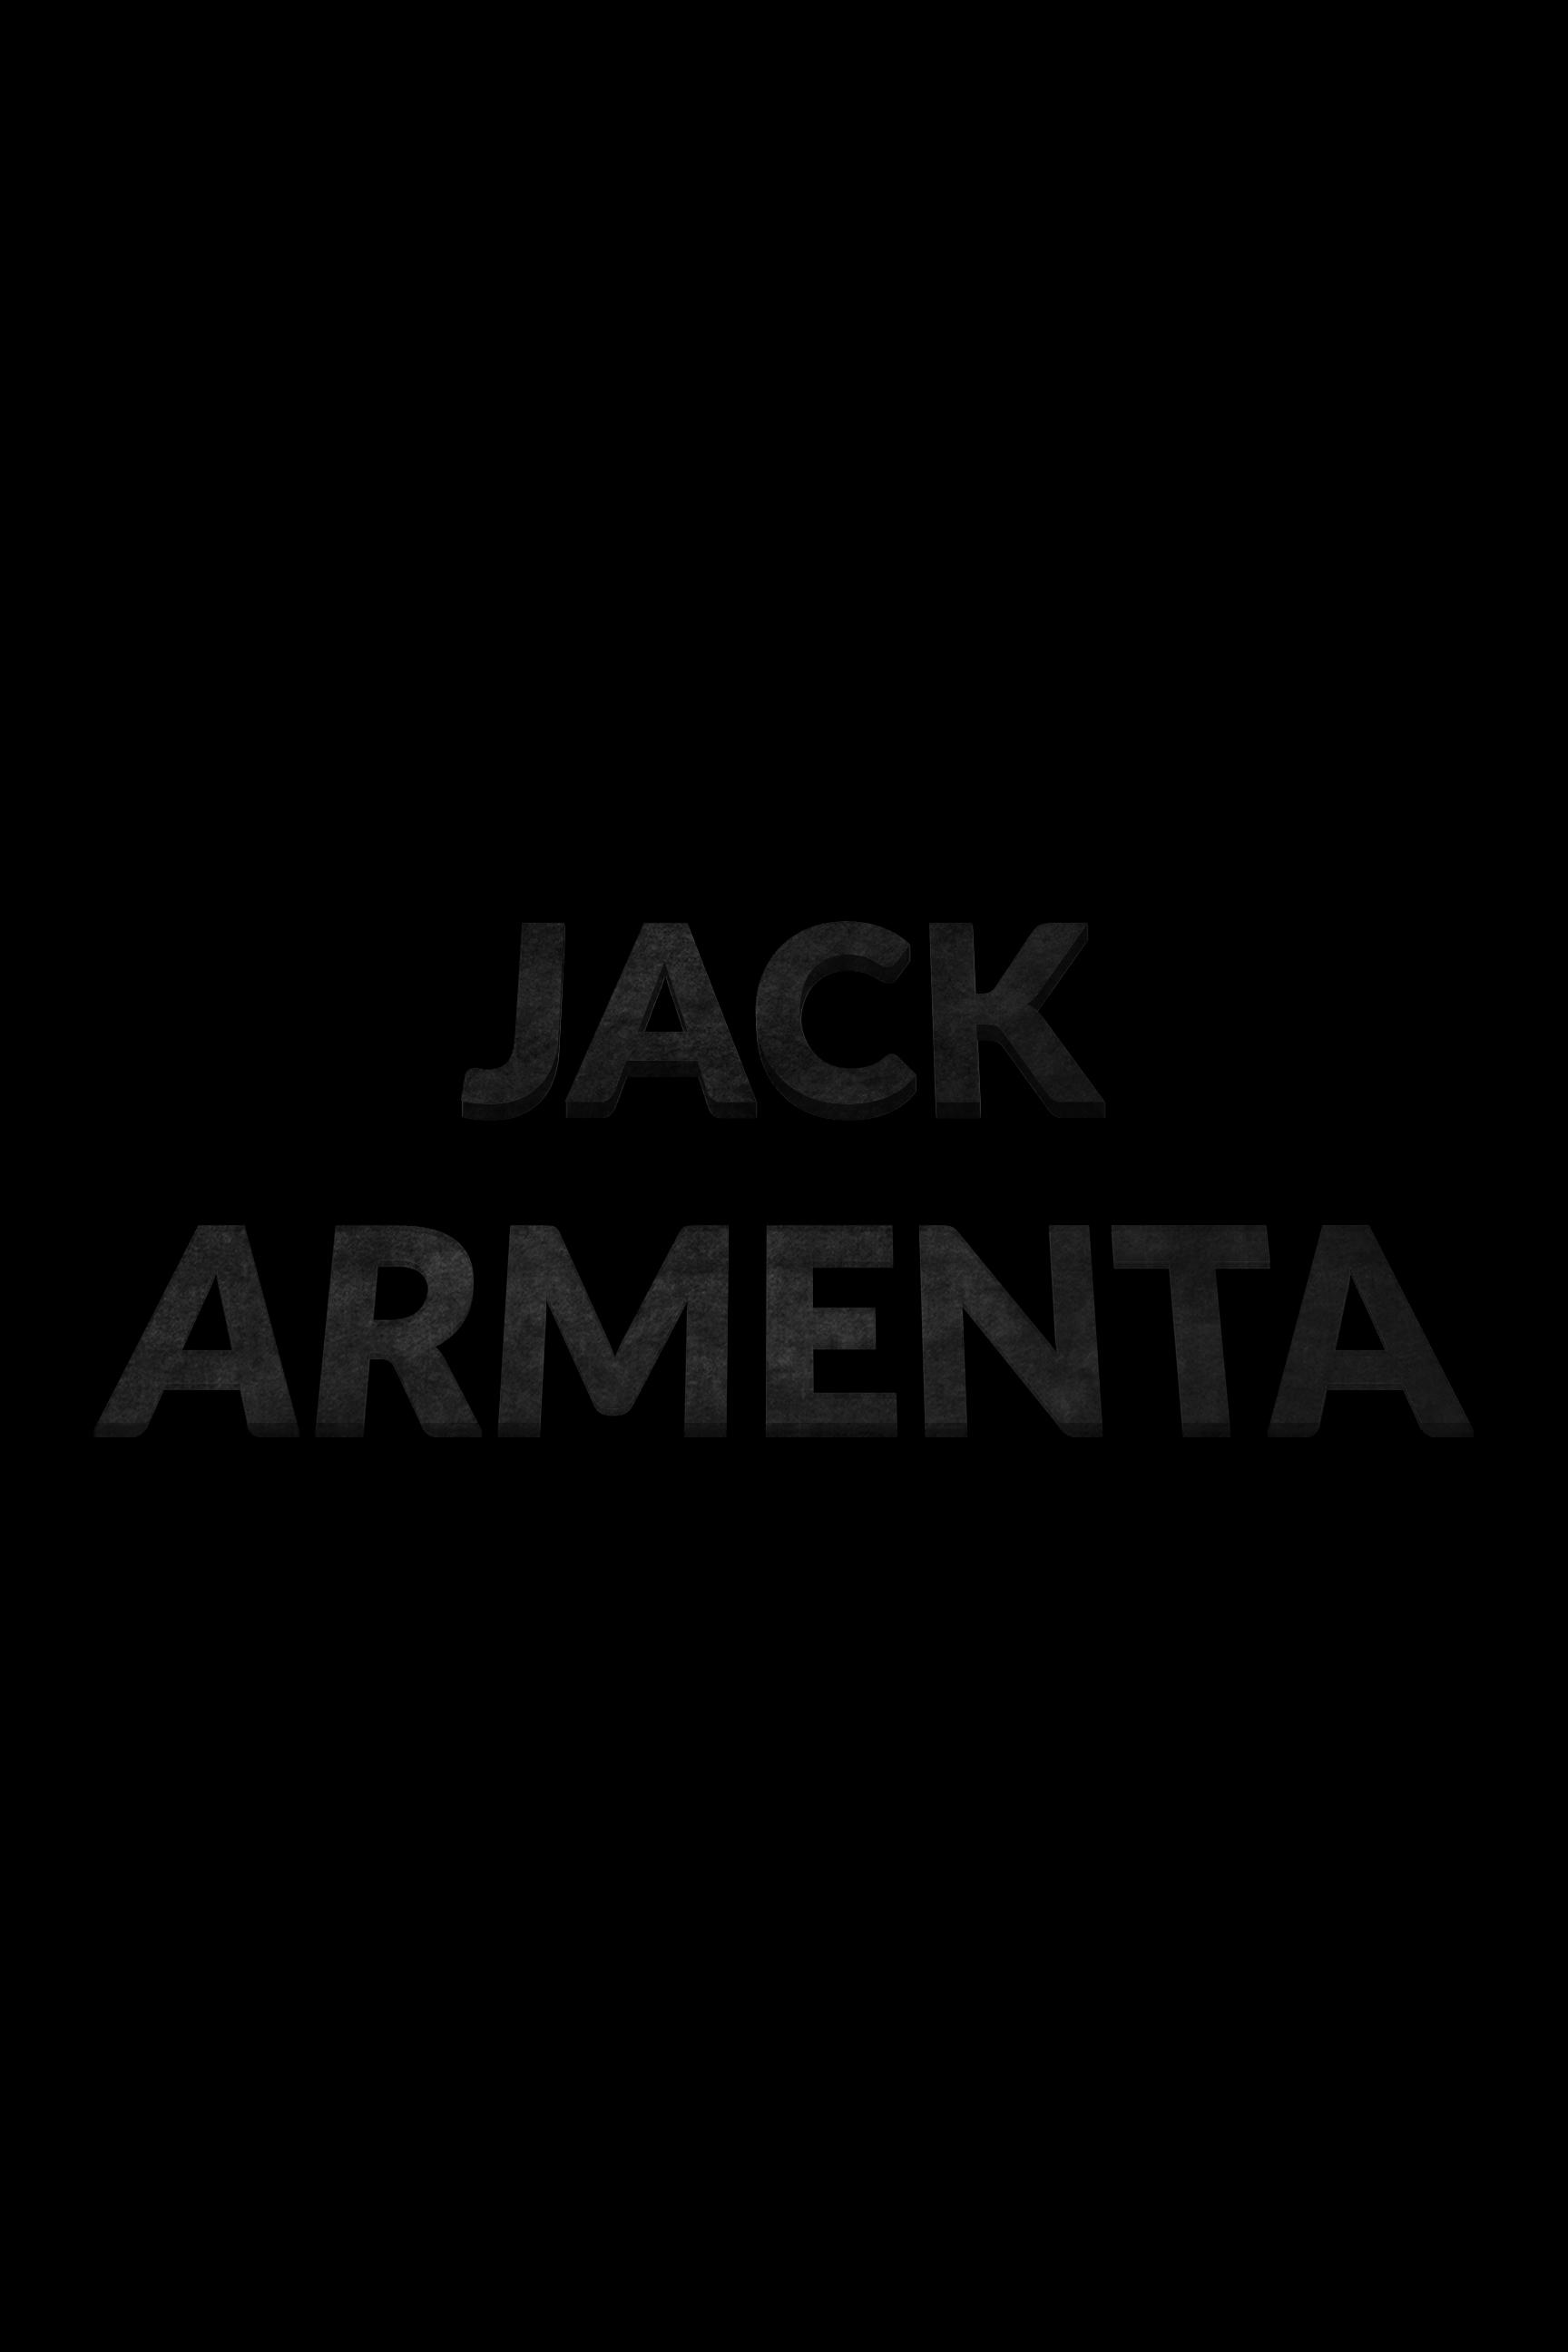 Jack Armenta